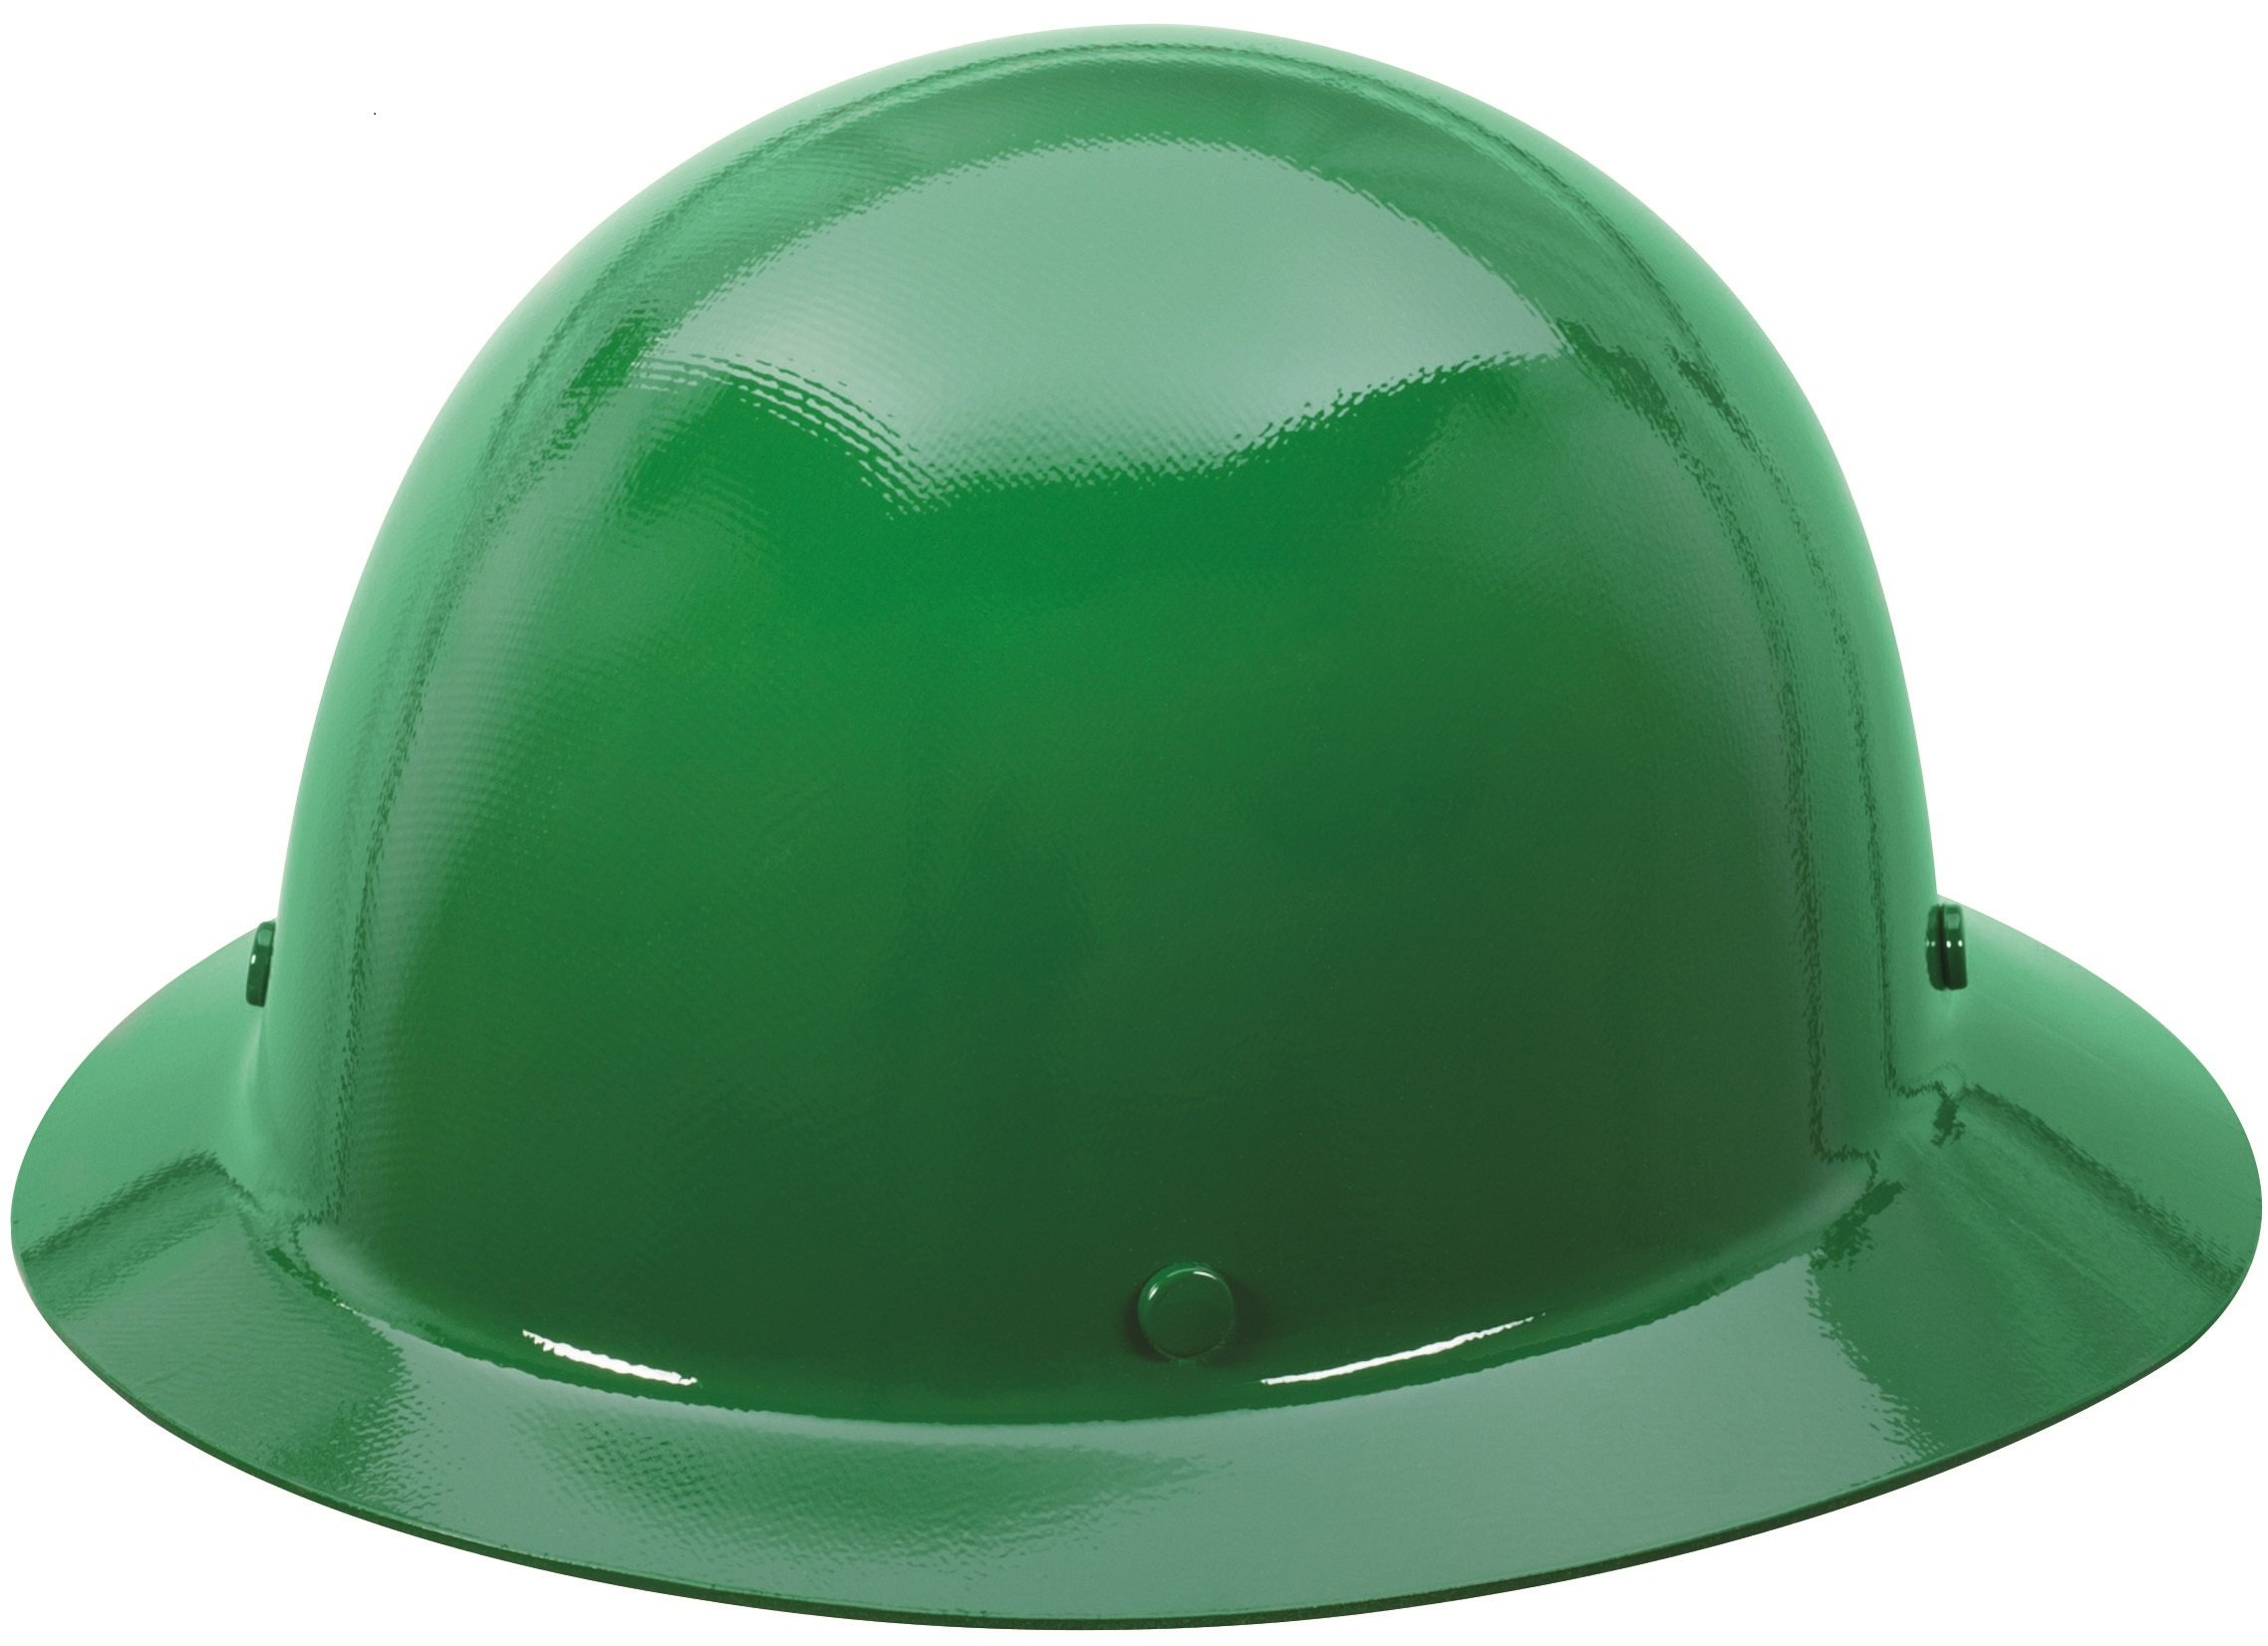 MSA 475411 Skullgard Protective Hard Hat Full Brim, Fas-Trac III Suspension, Standard Size, Green